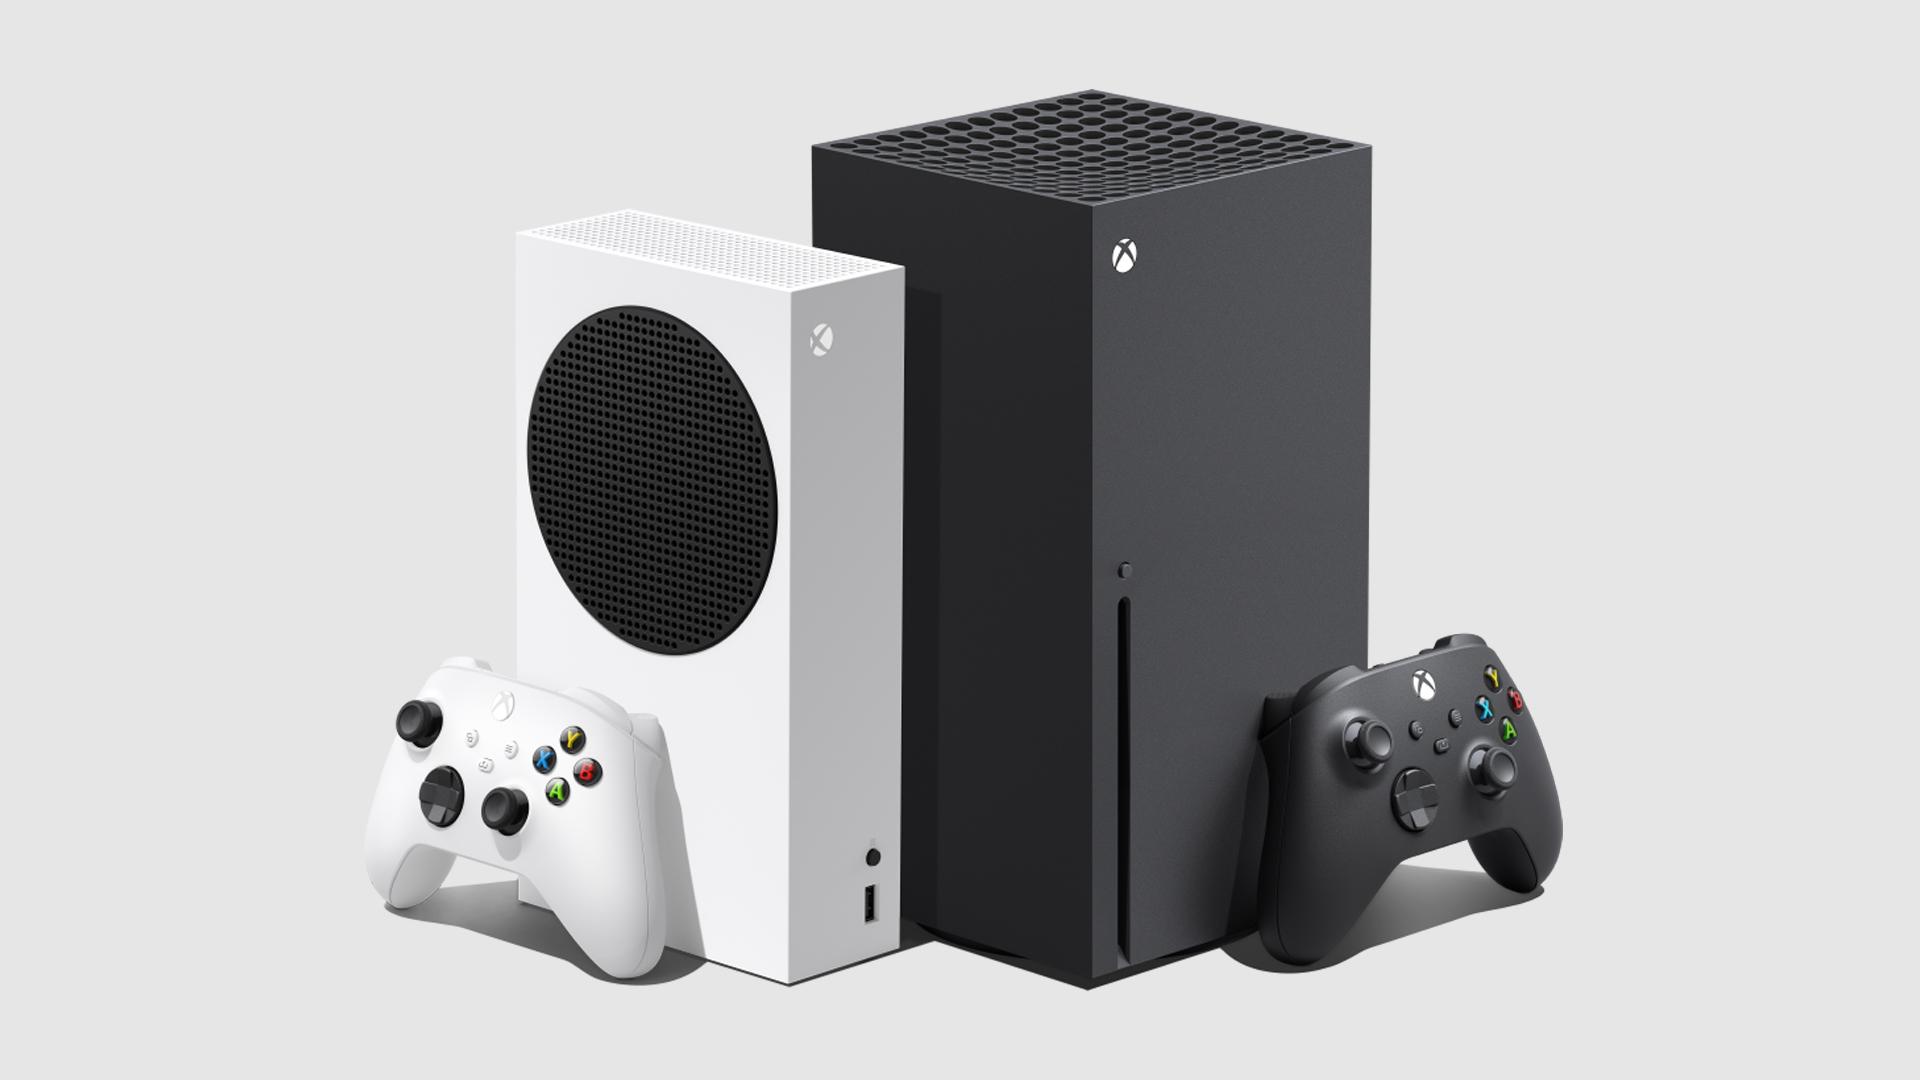 Where to buy Xbox Series X: all the latest stock updates | TechRadar